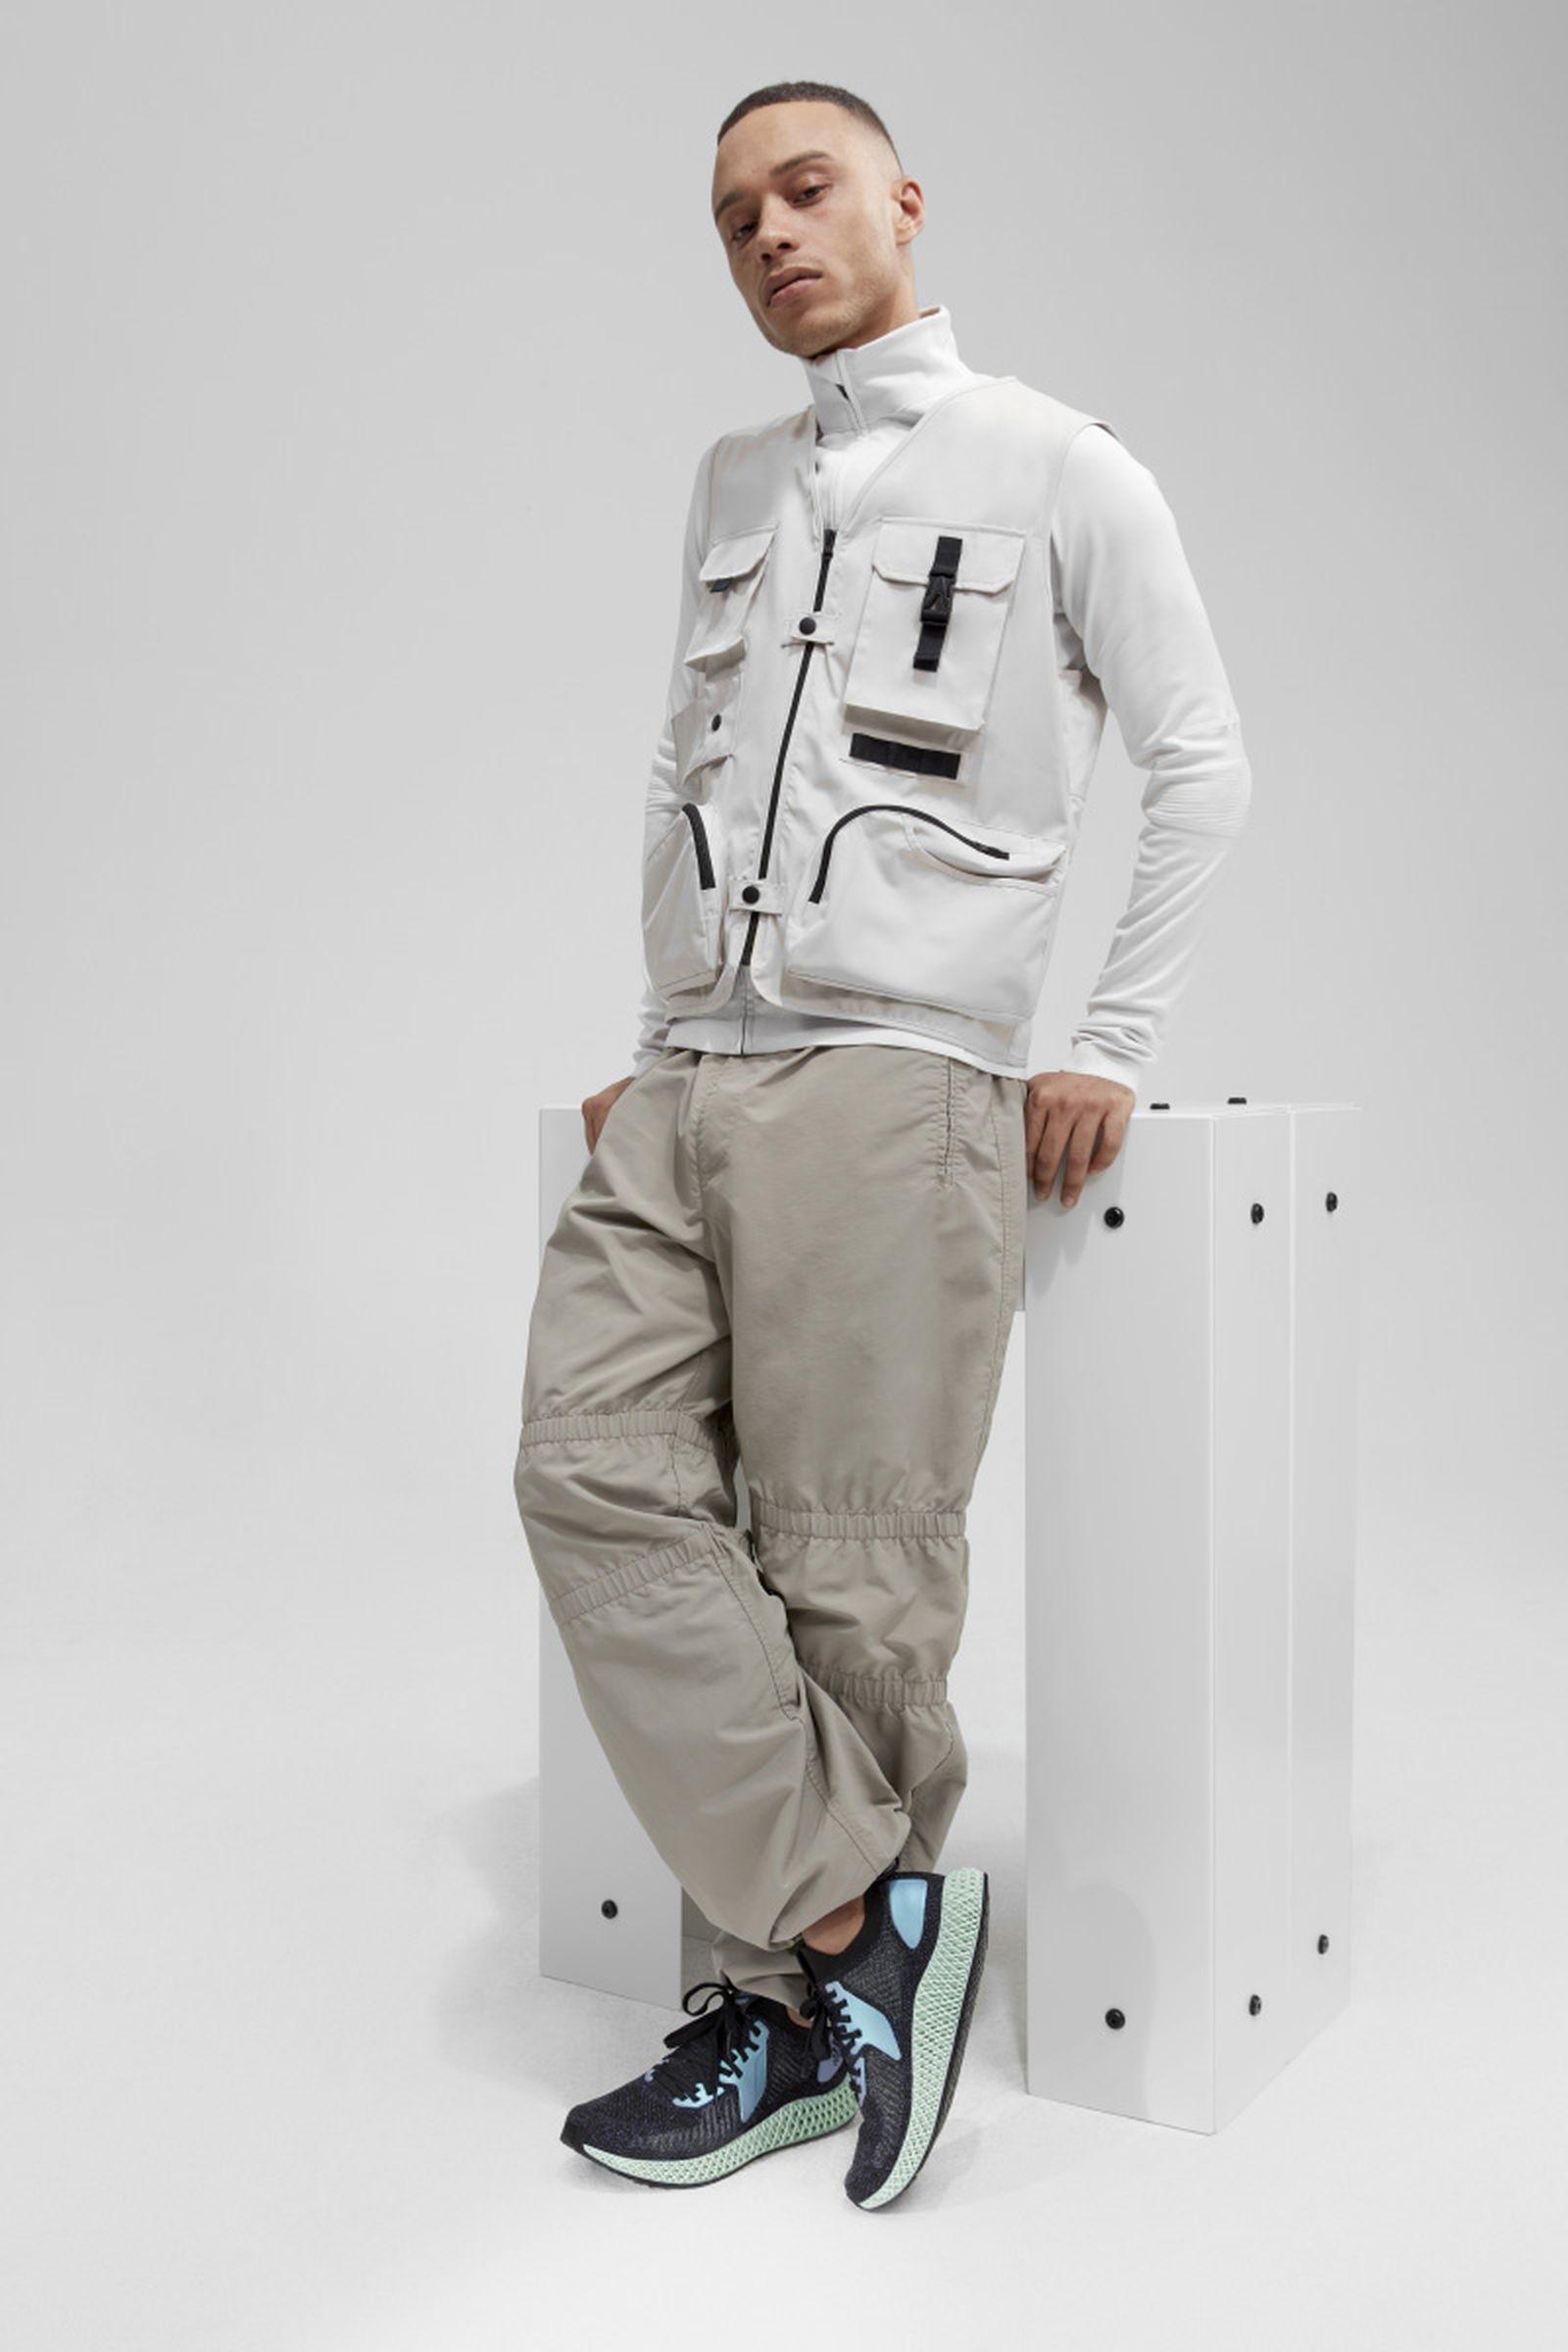 adidas-alphaedge-4d-goodbye-gravity-02